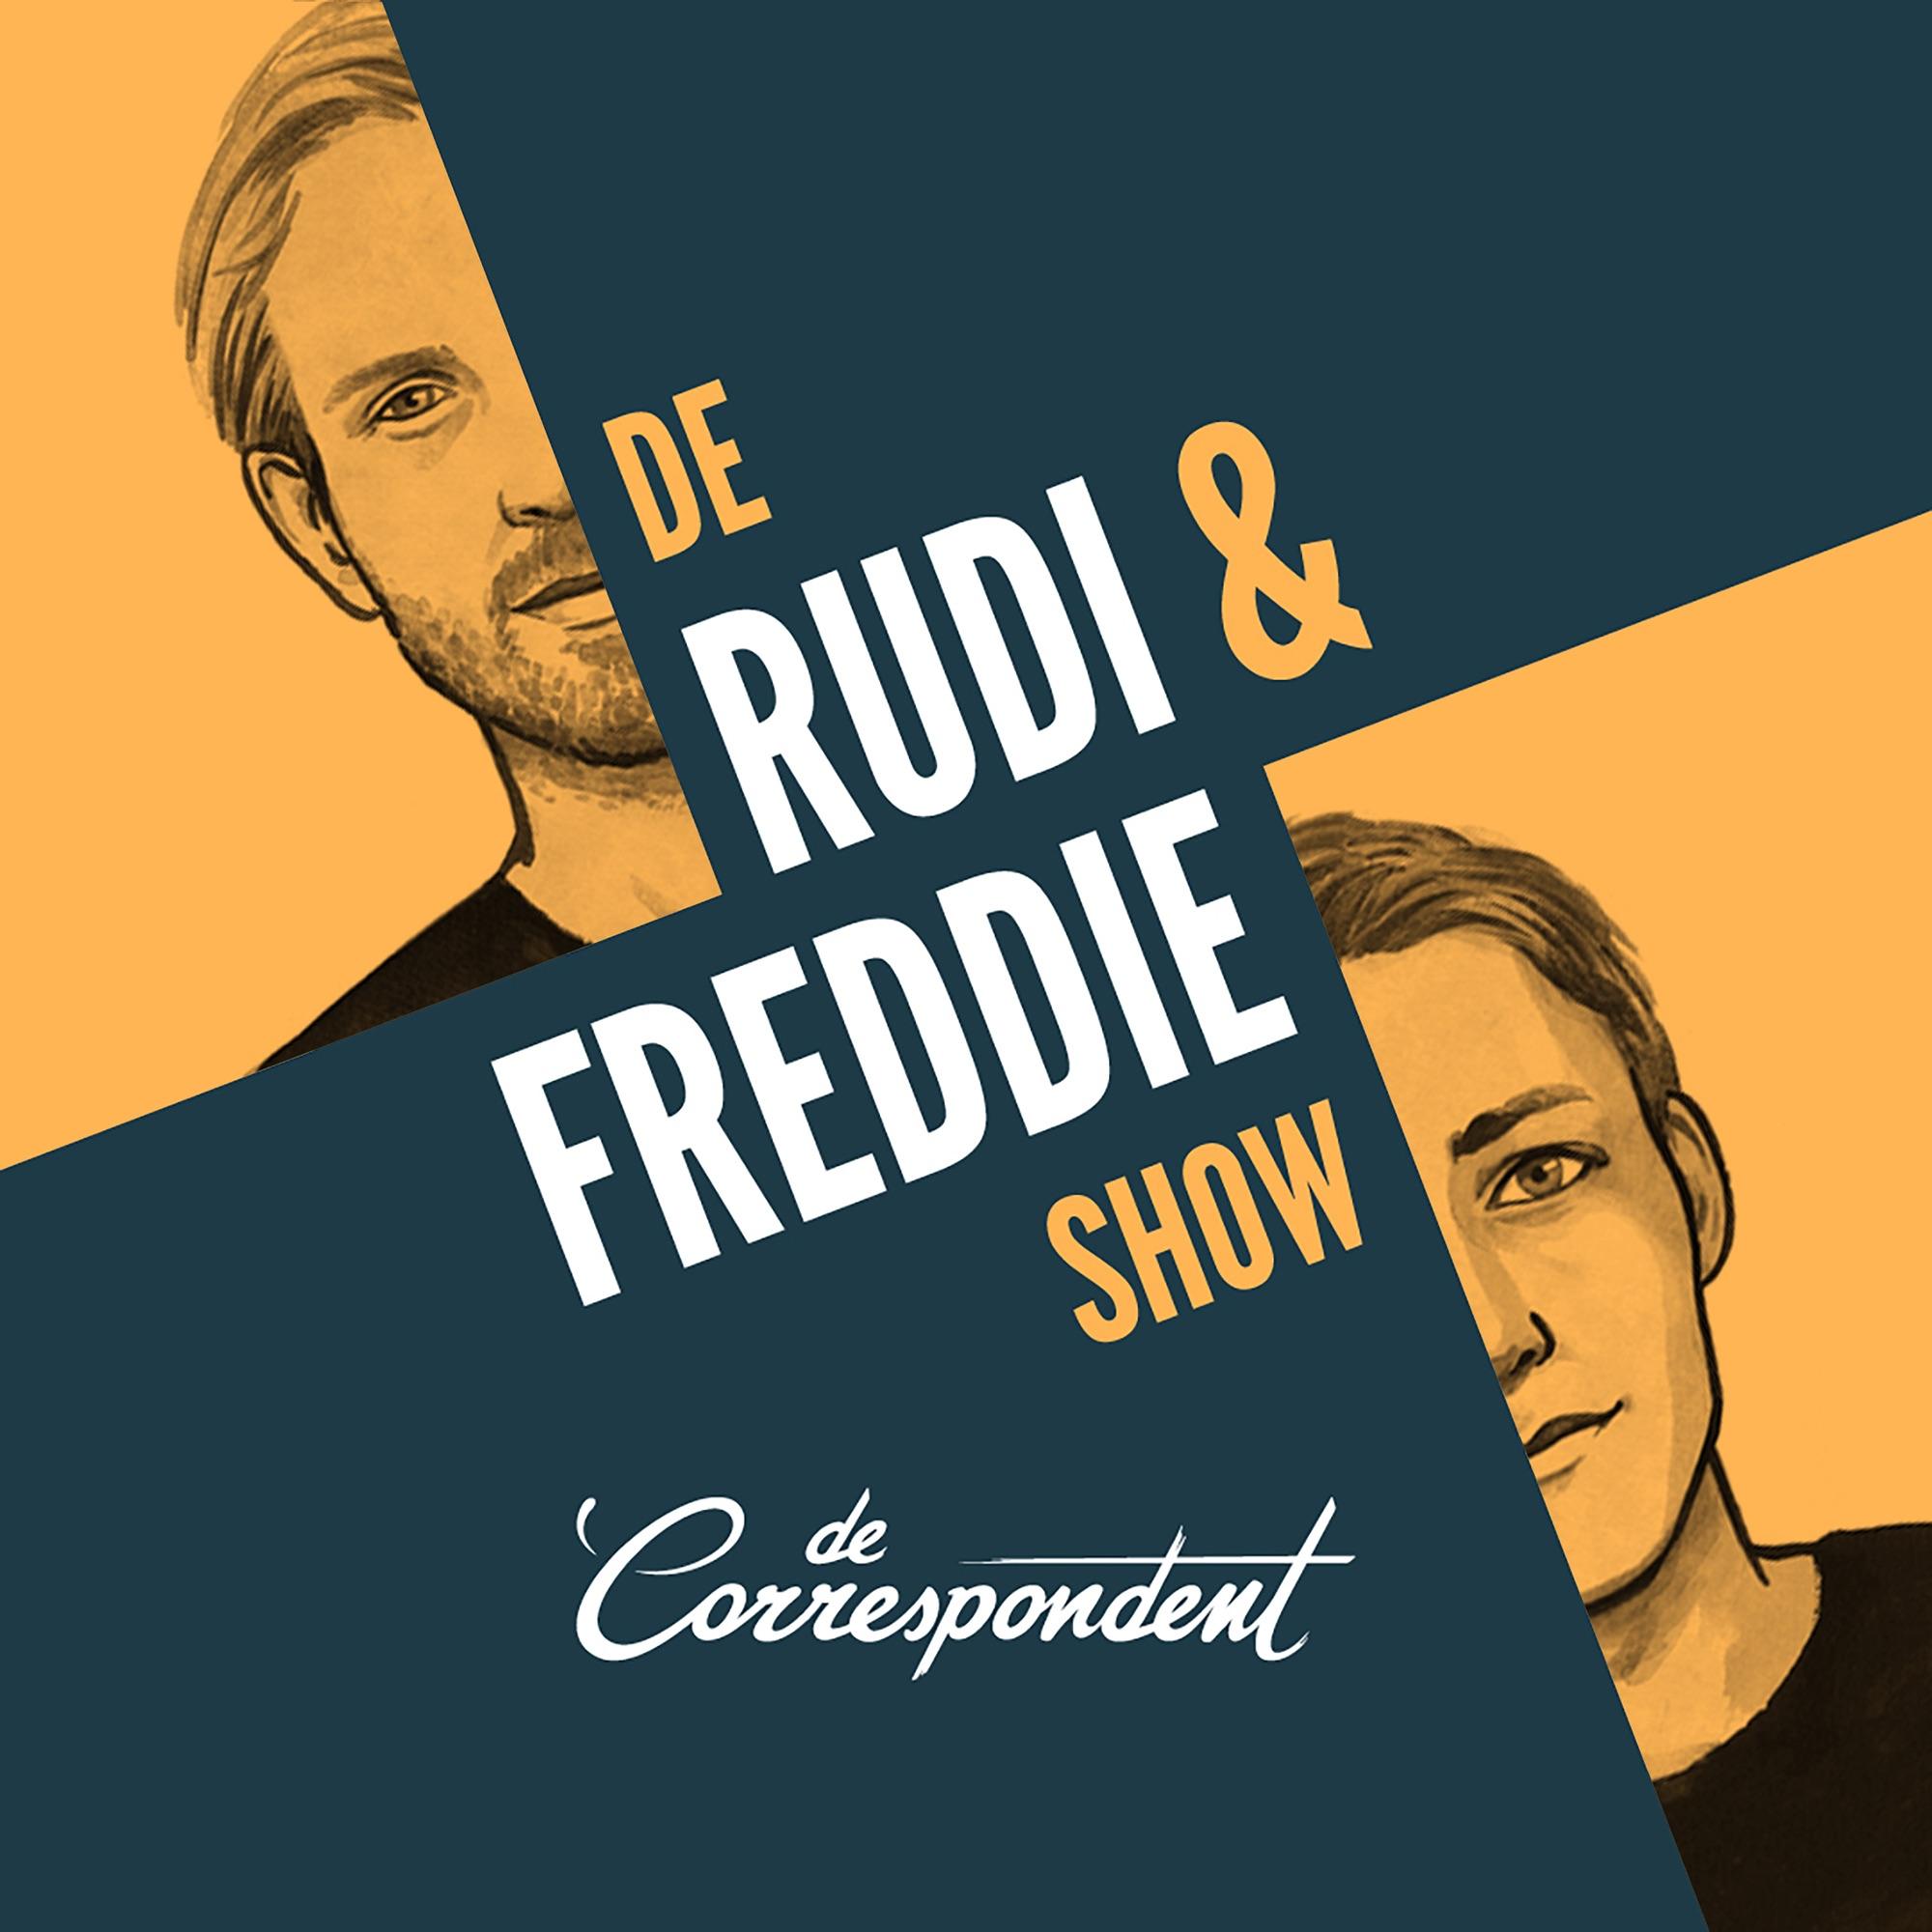 De Rudi & Freddie Show logo